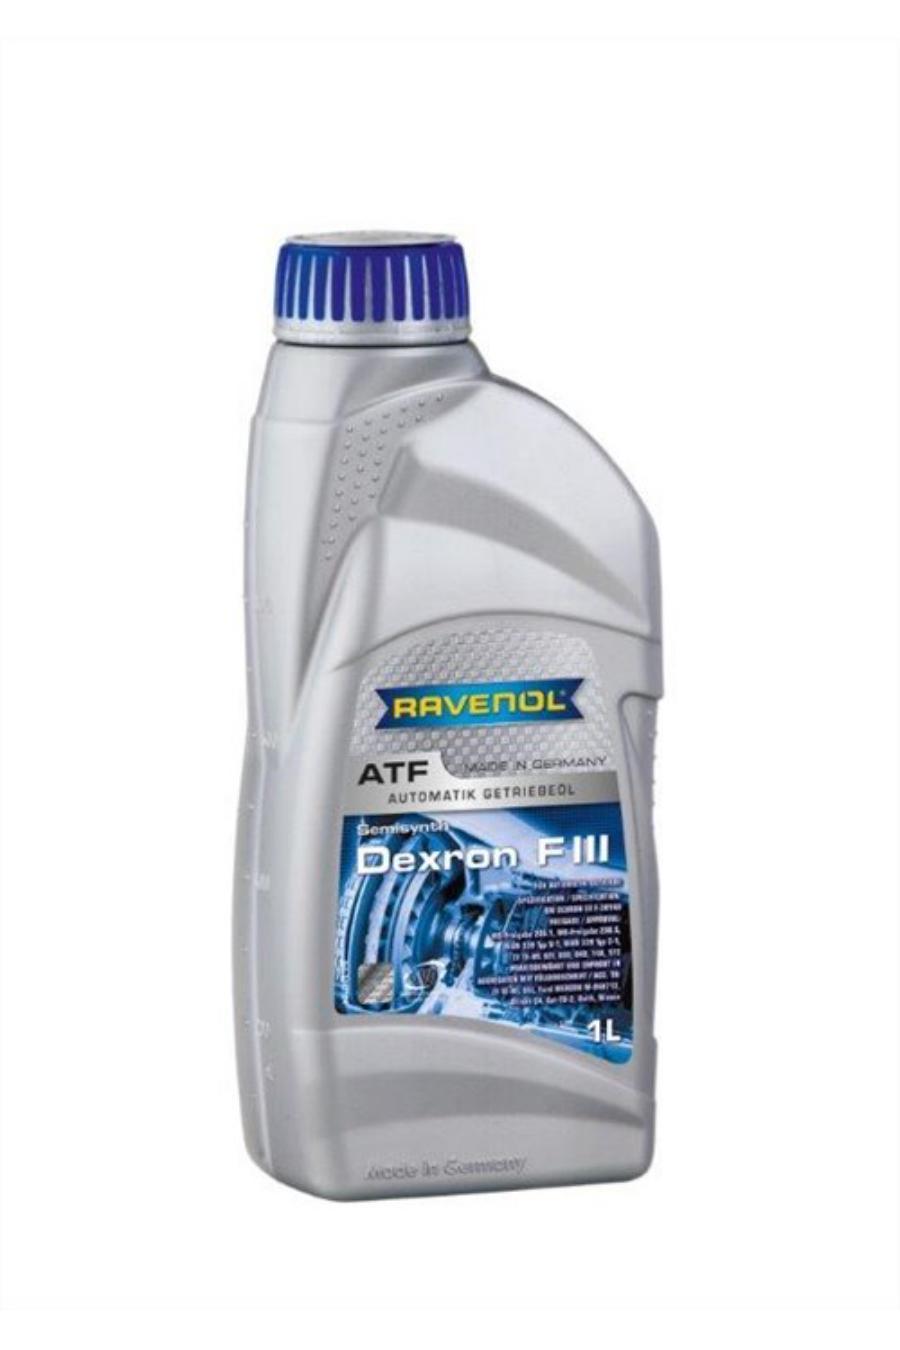 Трансмиссионное масло ravenol atf dexron f iii ( 1л) new